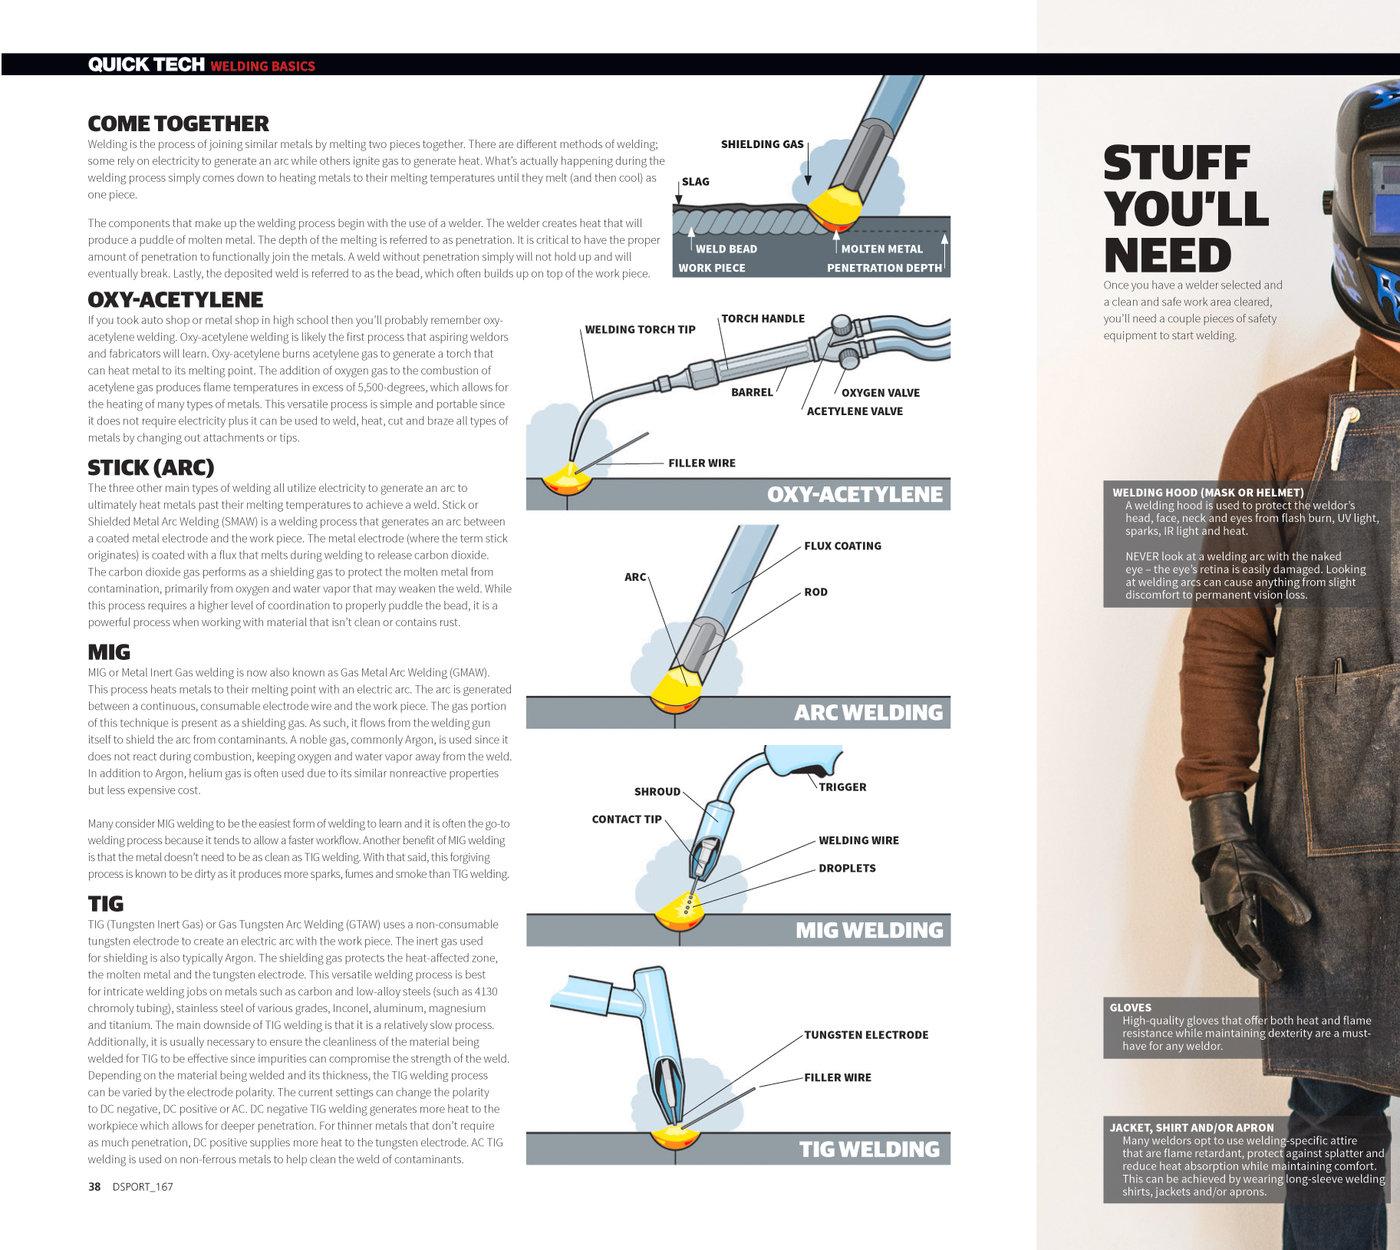 Cutaways And Diagrams By Paul Laguette At Scion Tc Engine Diagram